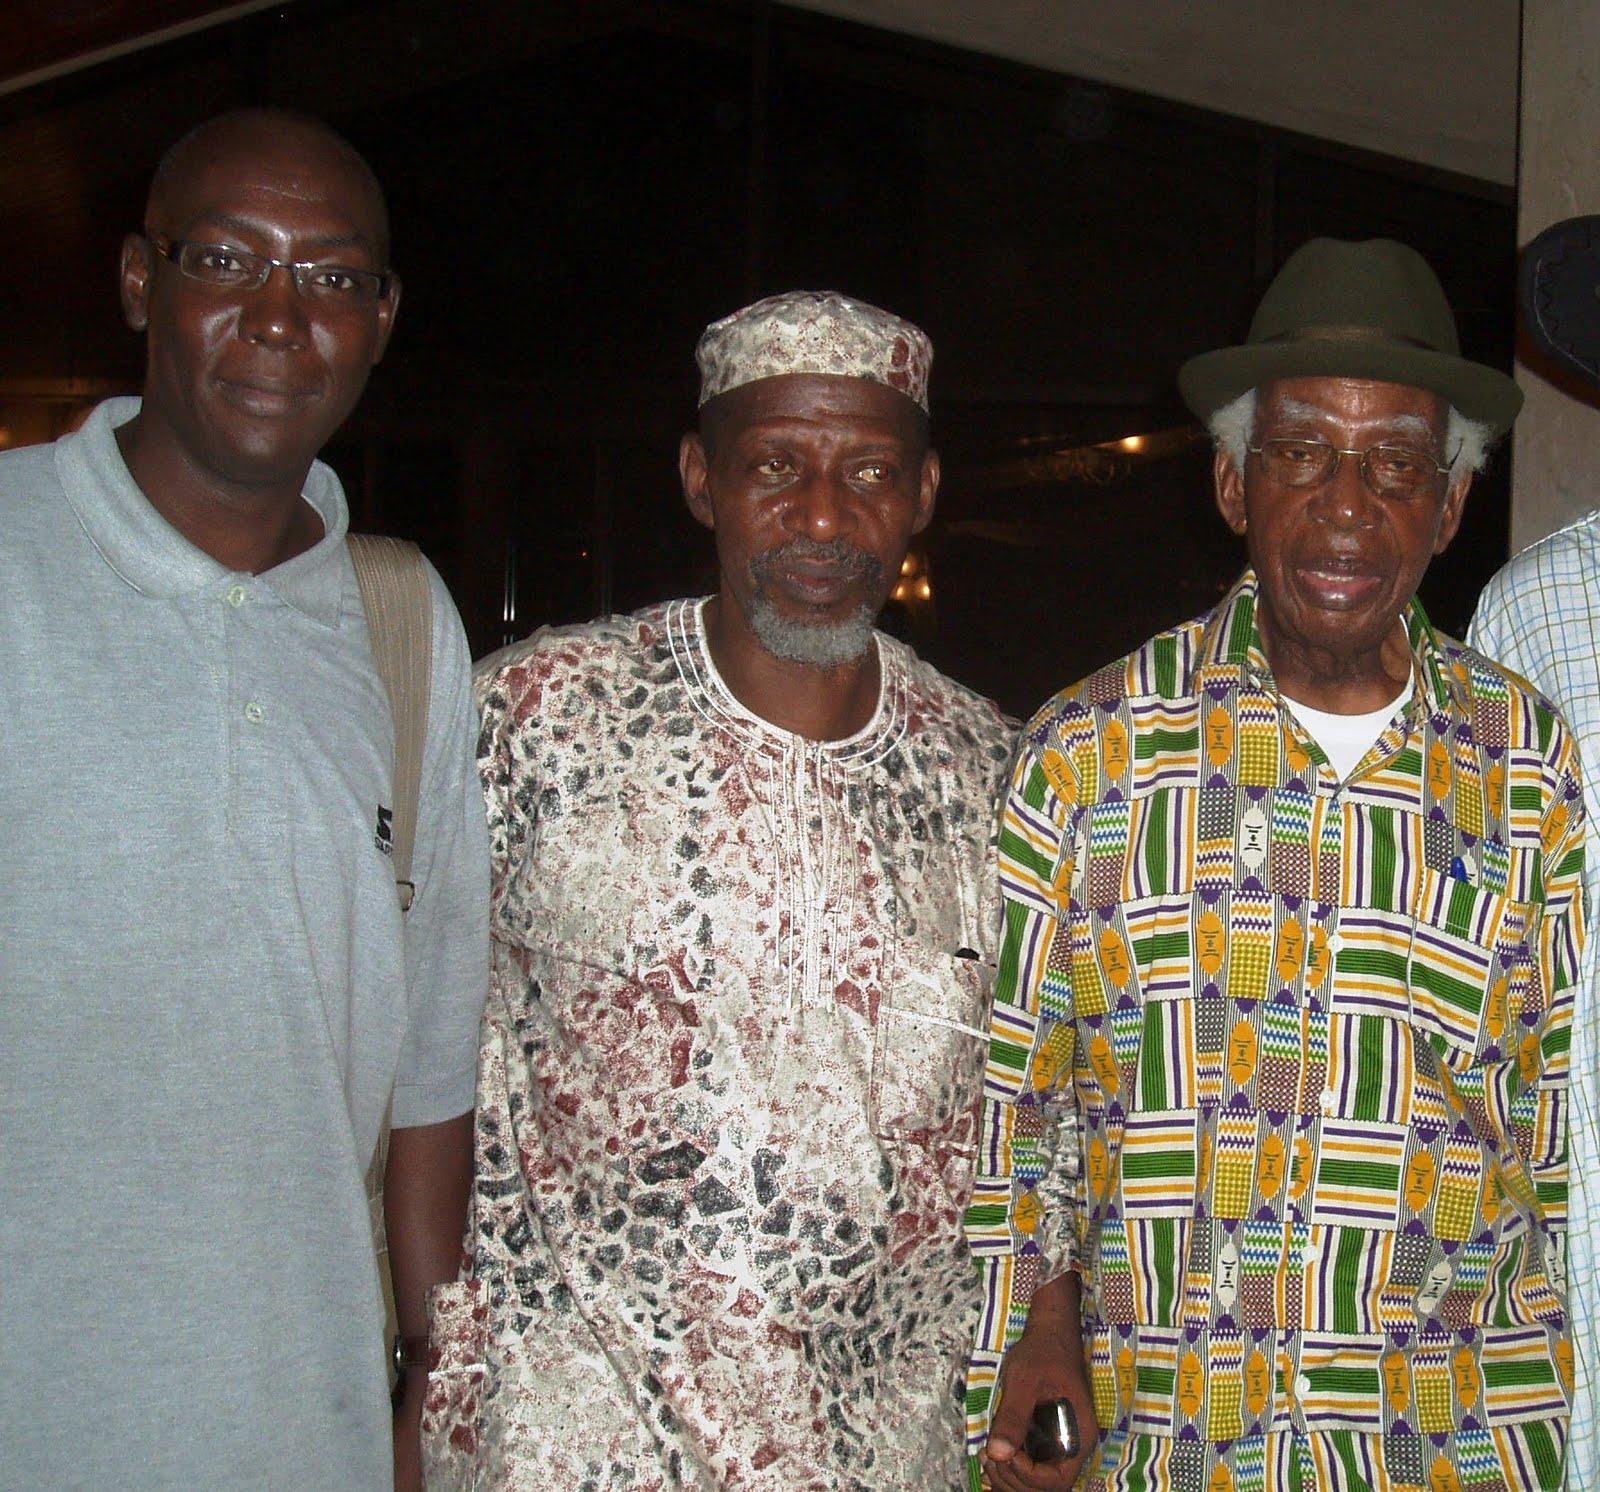 the mystic drum gabriel okara 'the mystic drum': critical commentary on azuonye, chukwuma, 'the mystic drum': critical commentary on gabriel okara's love lyrics (2011.